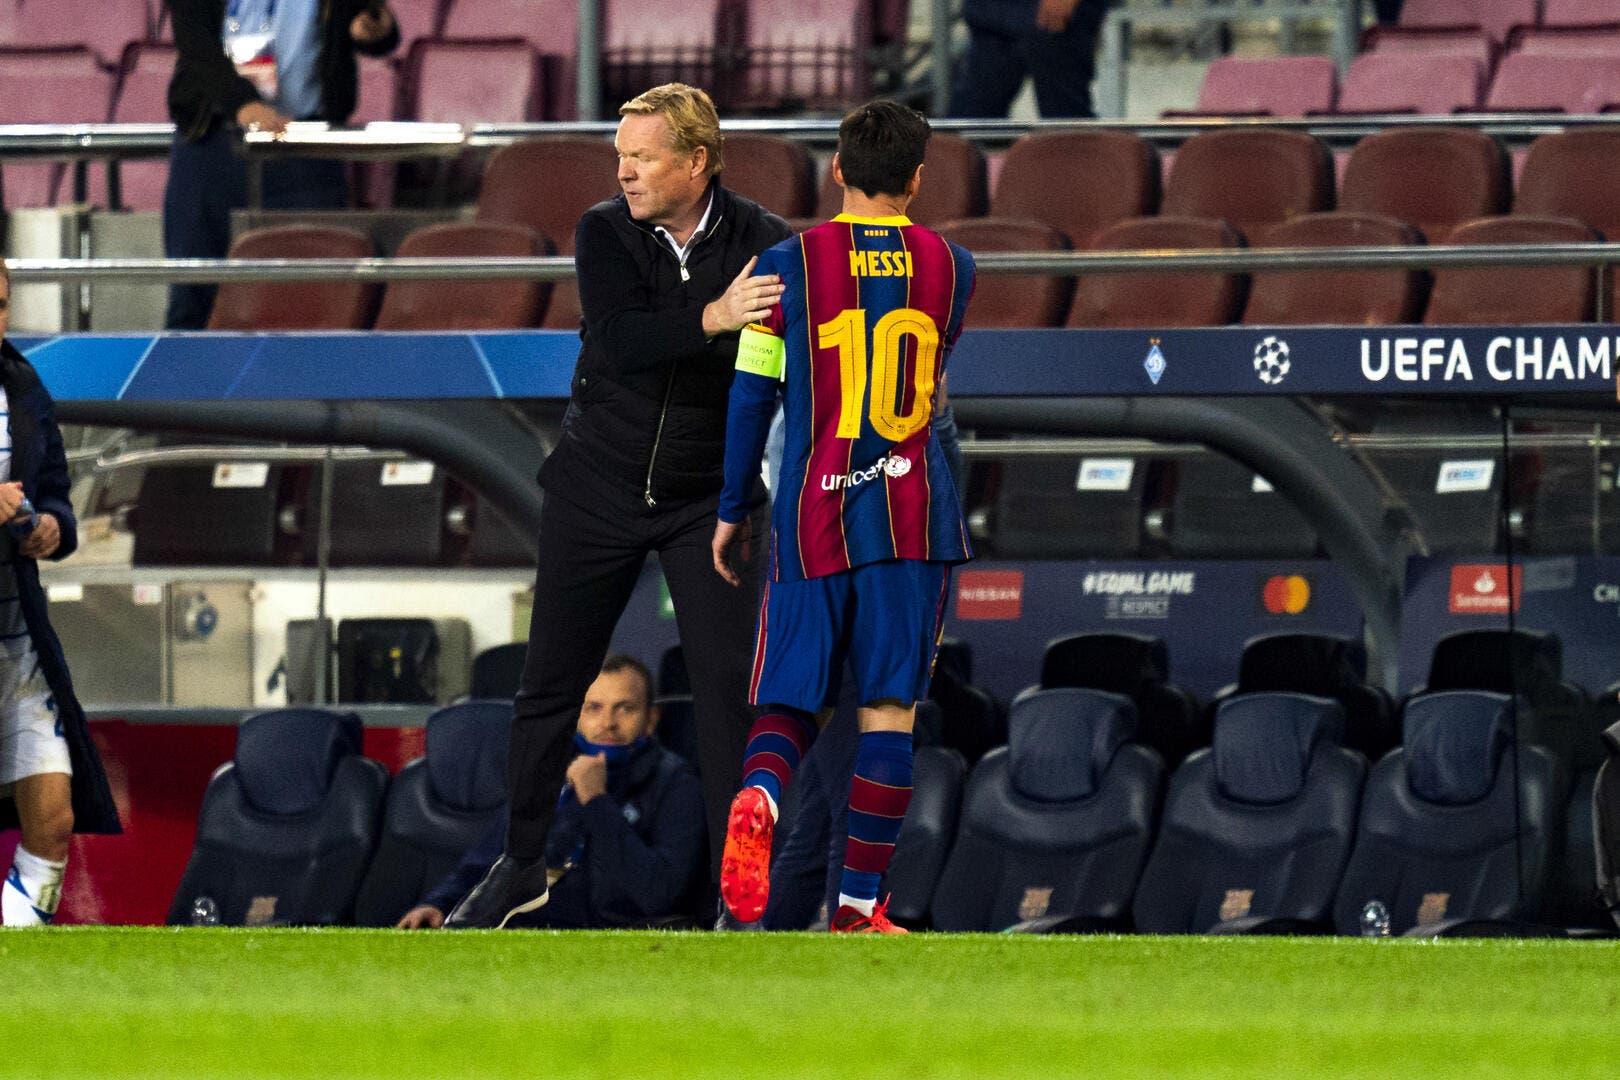 PSG : Messi paye l'absence de Ballon d'Or, France Football accusé - Foot01.com